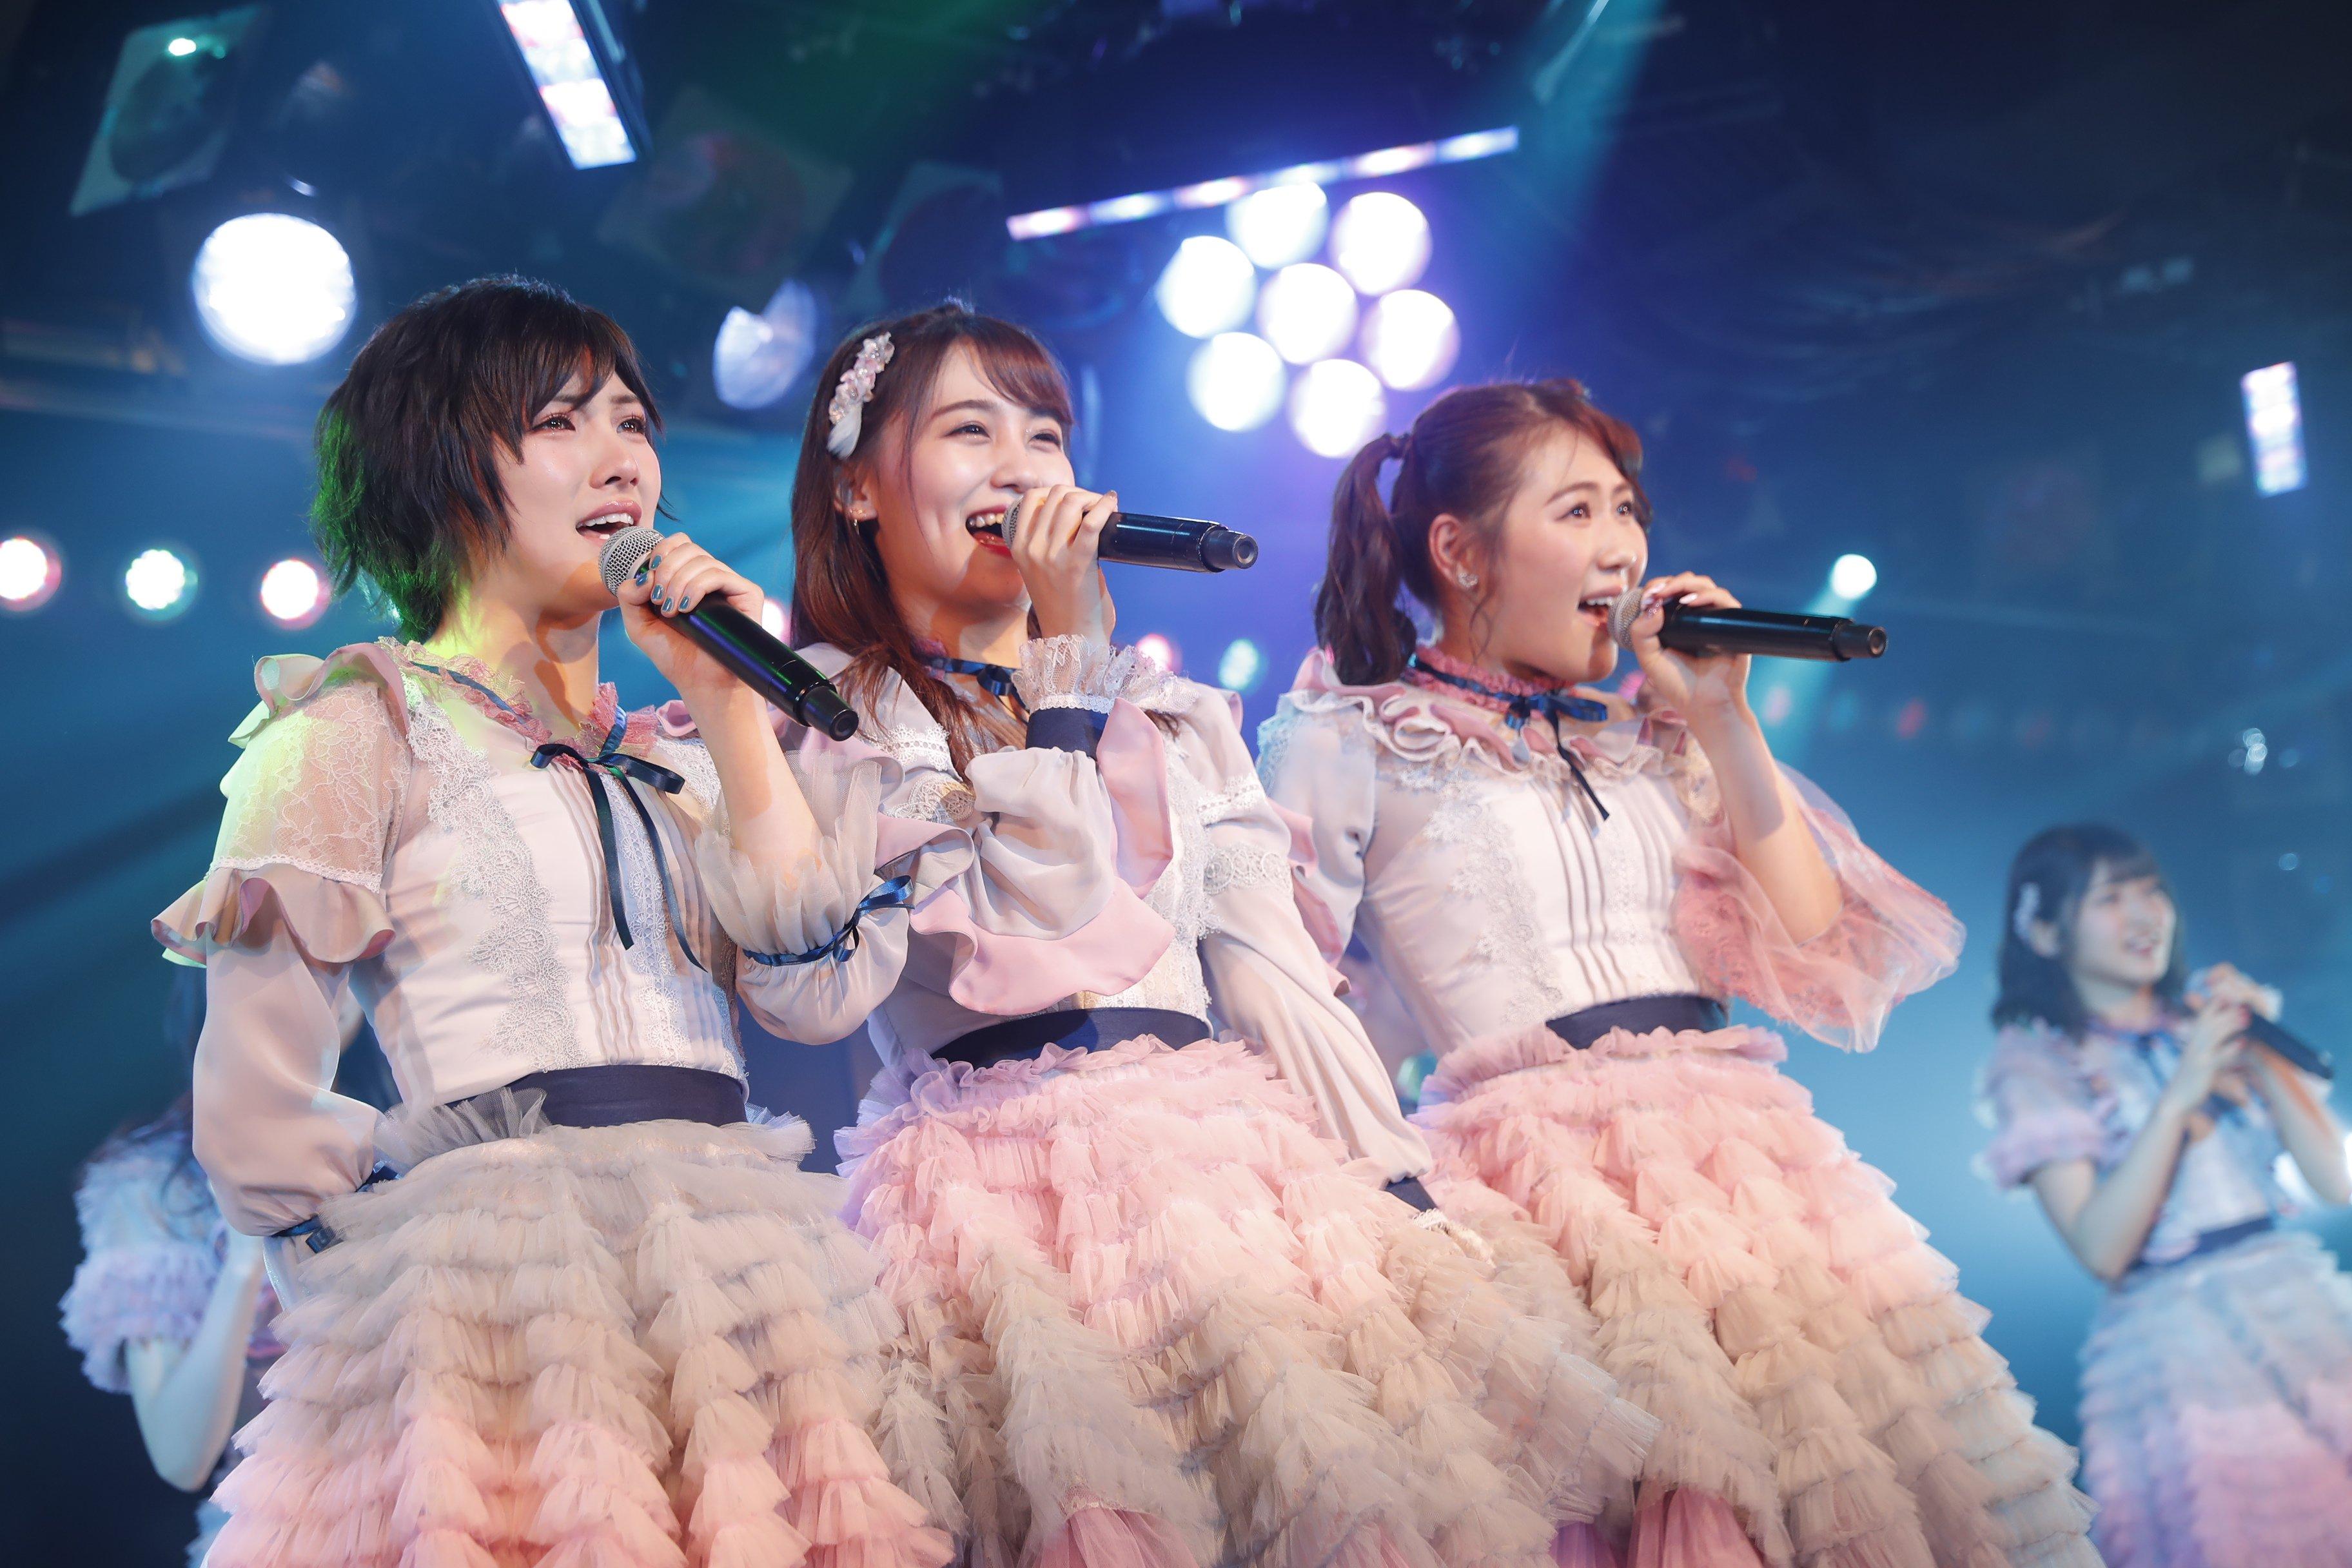 AKB48小嶋真子「みんなの笑顔が私のエネルギー」笑顔で卒業【写真10枚】の画像003